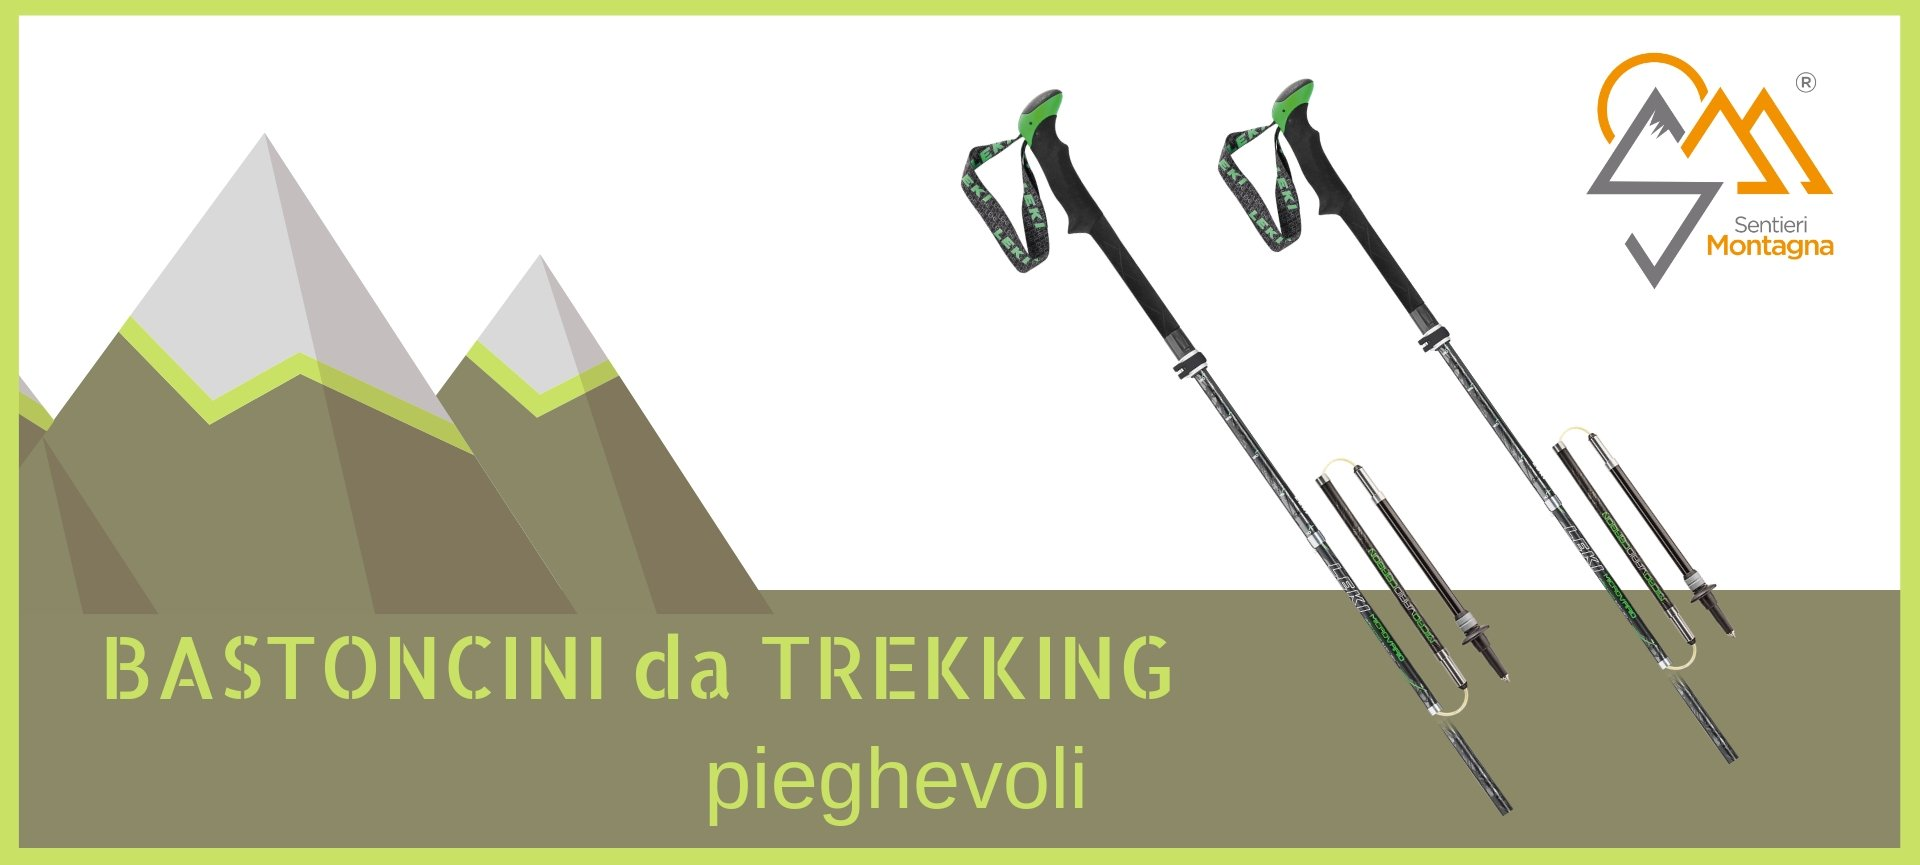 Bastoncini Trekking pieghevoli